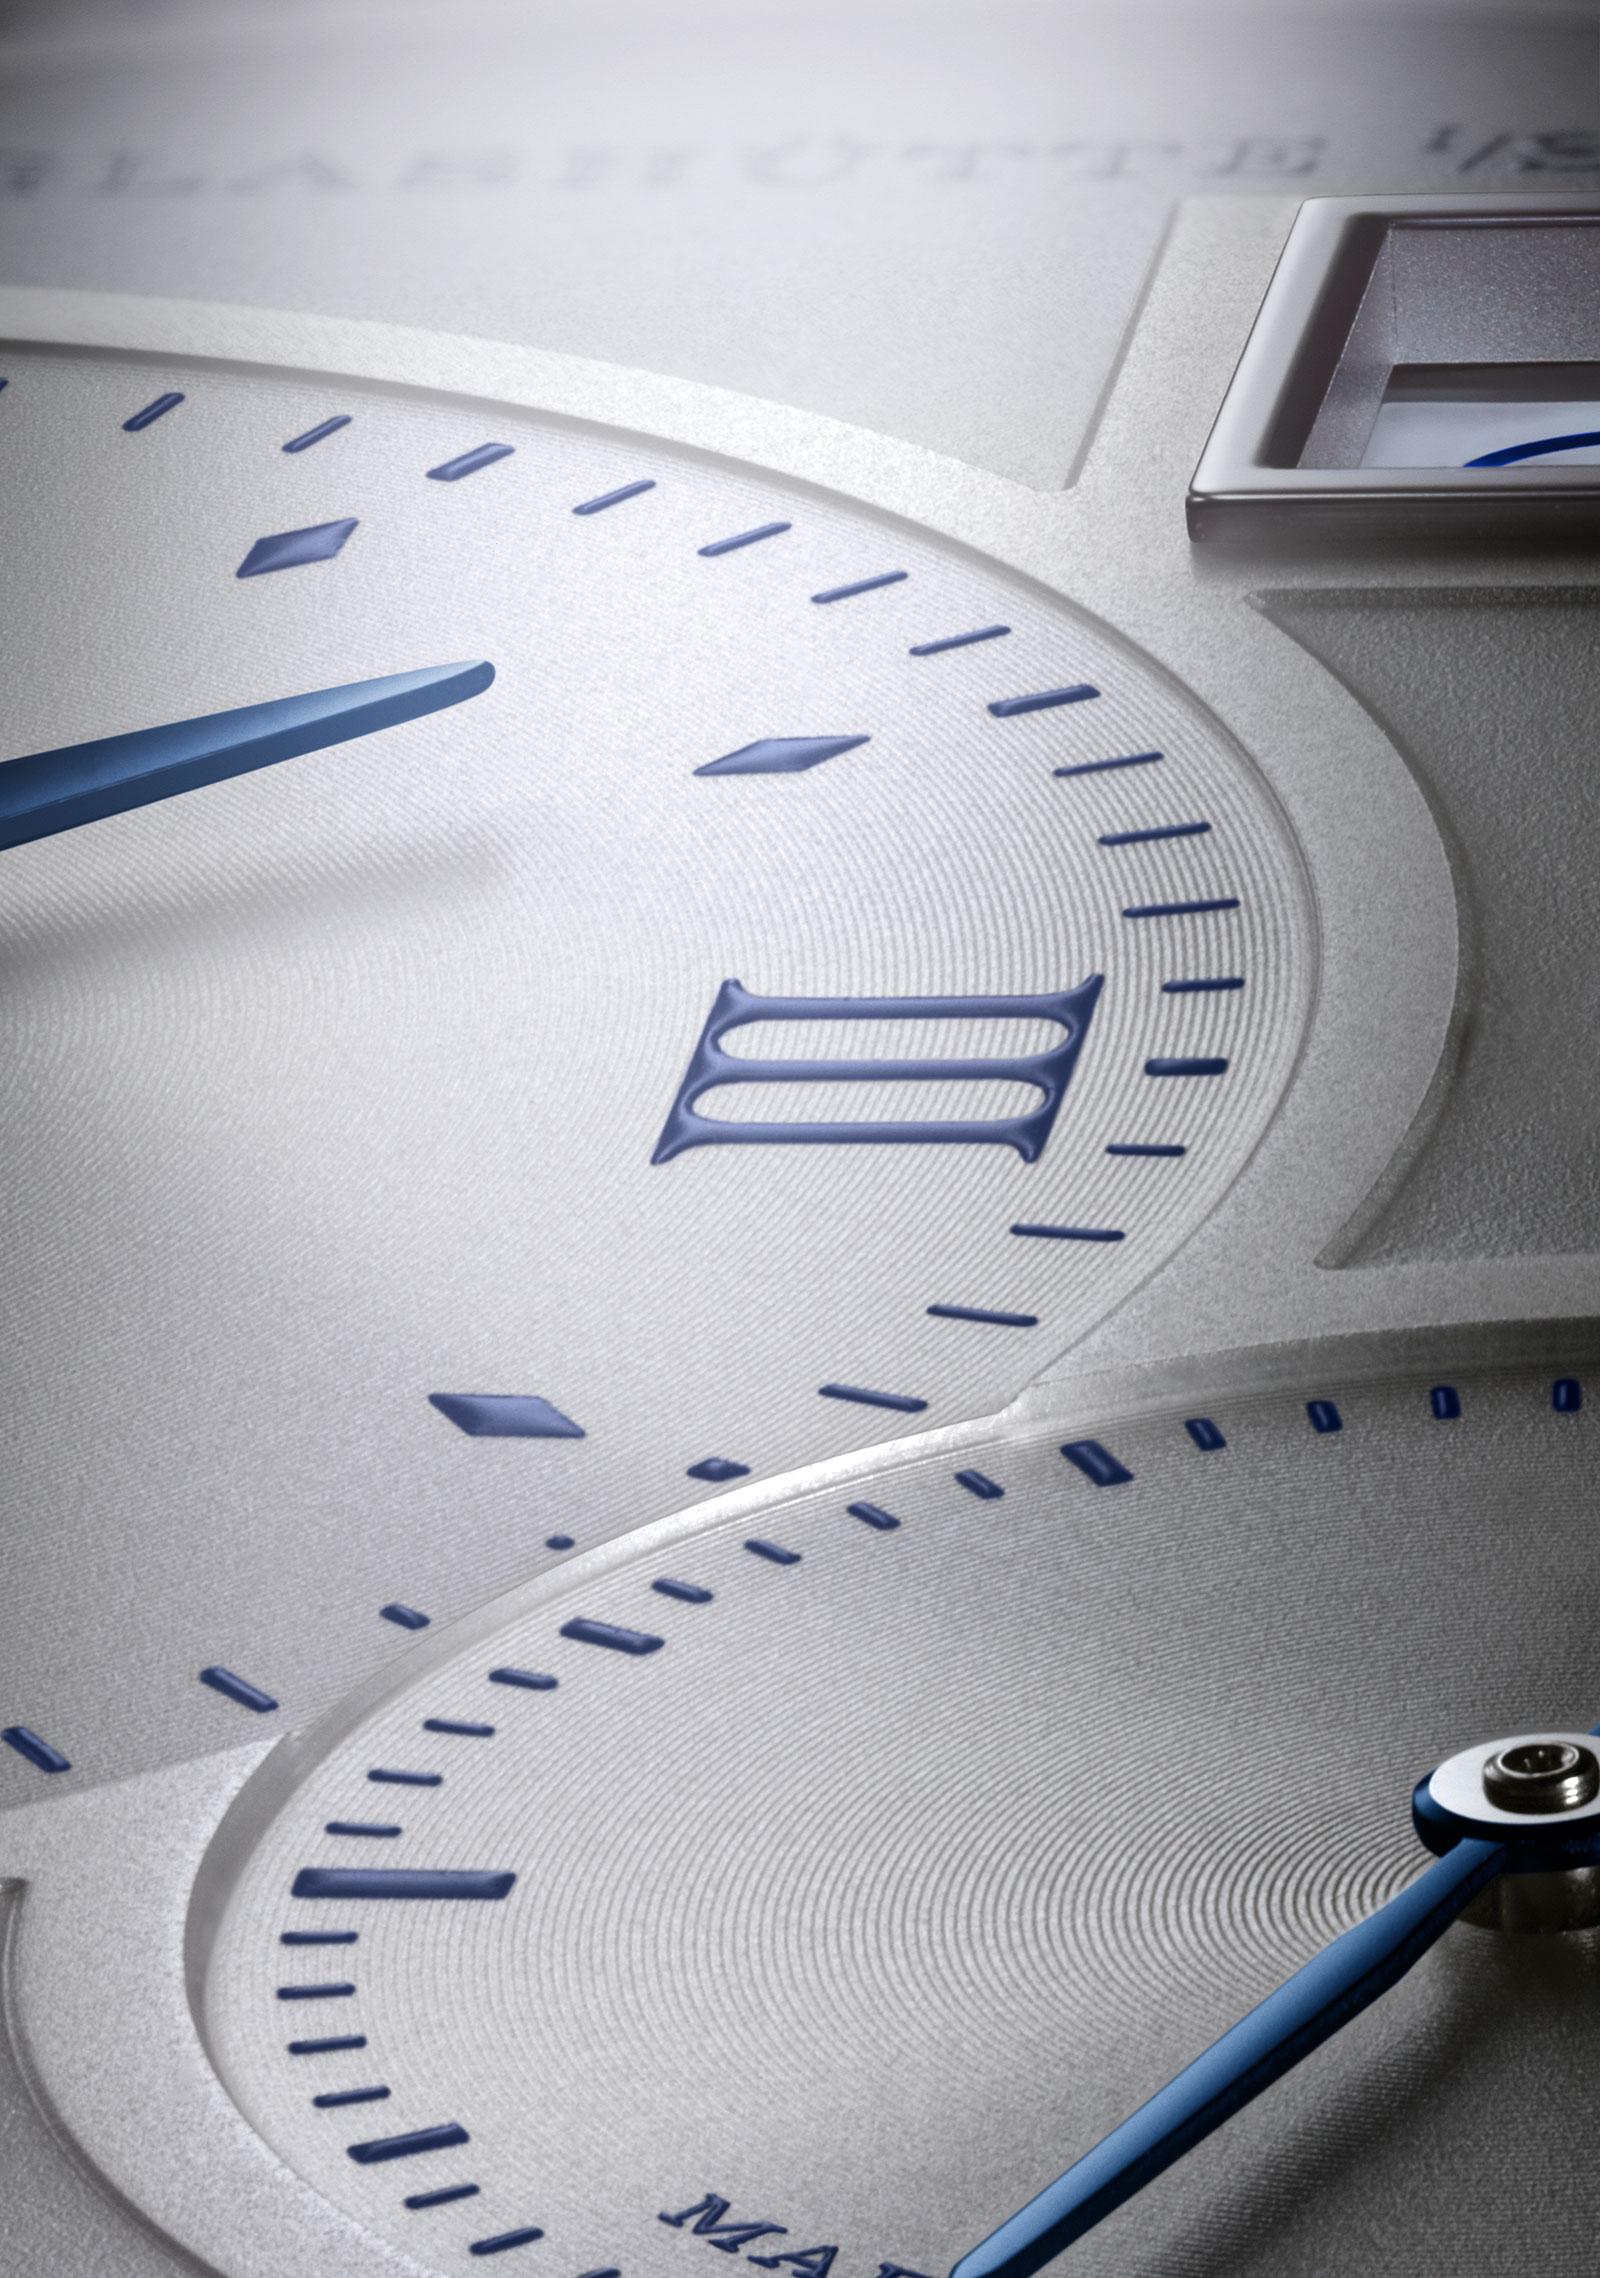 Lange-1-25th-Anniversary-watch-9